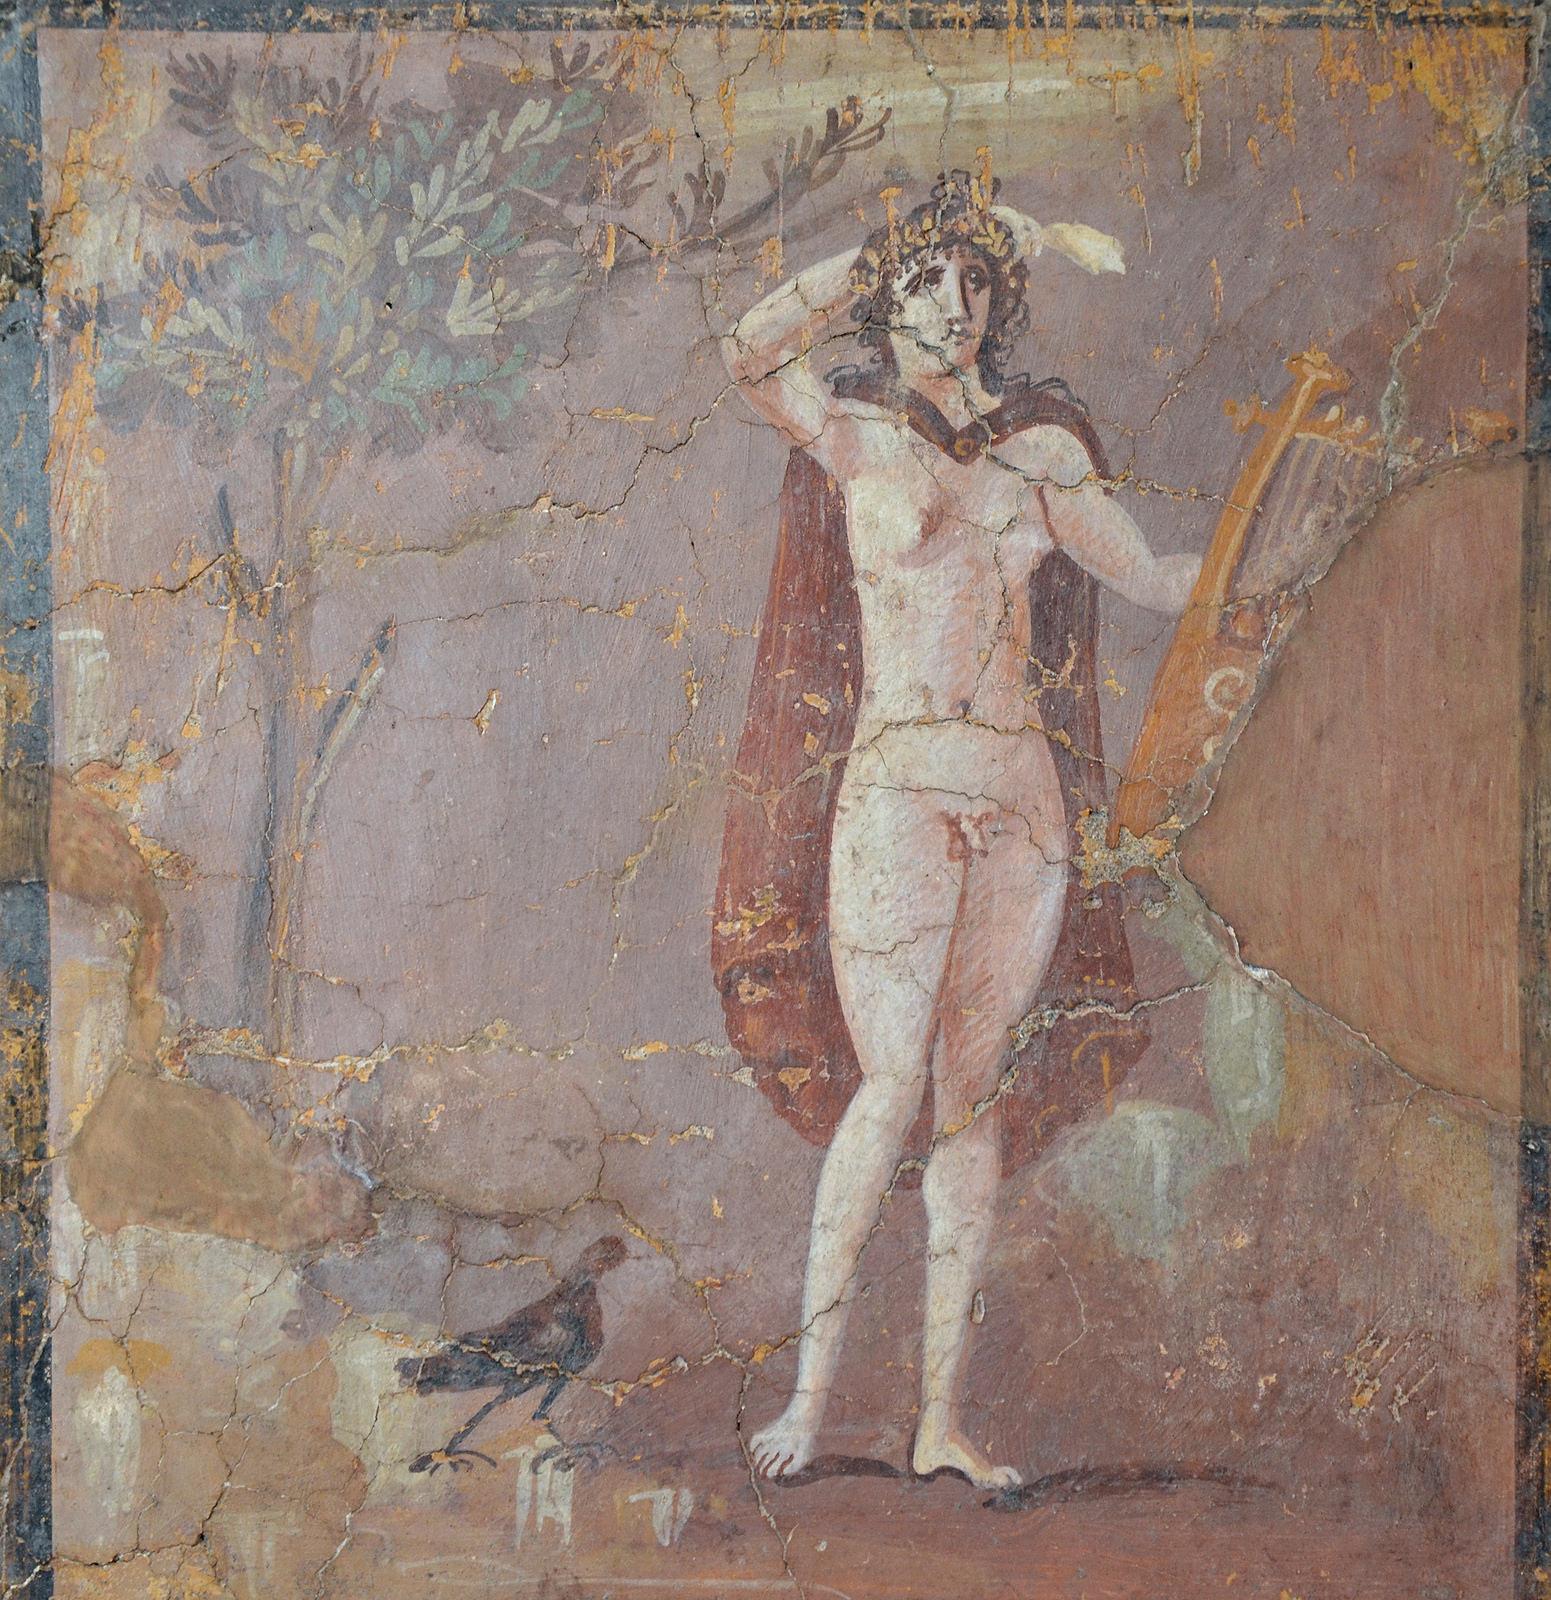 Roman Hermaphrodite Fresco (Illustration) - Ancient History Encyclopedia